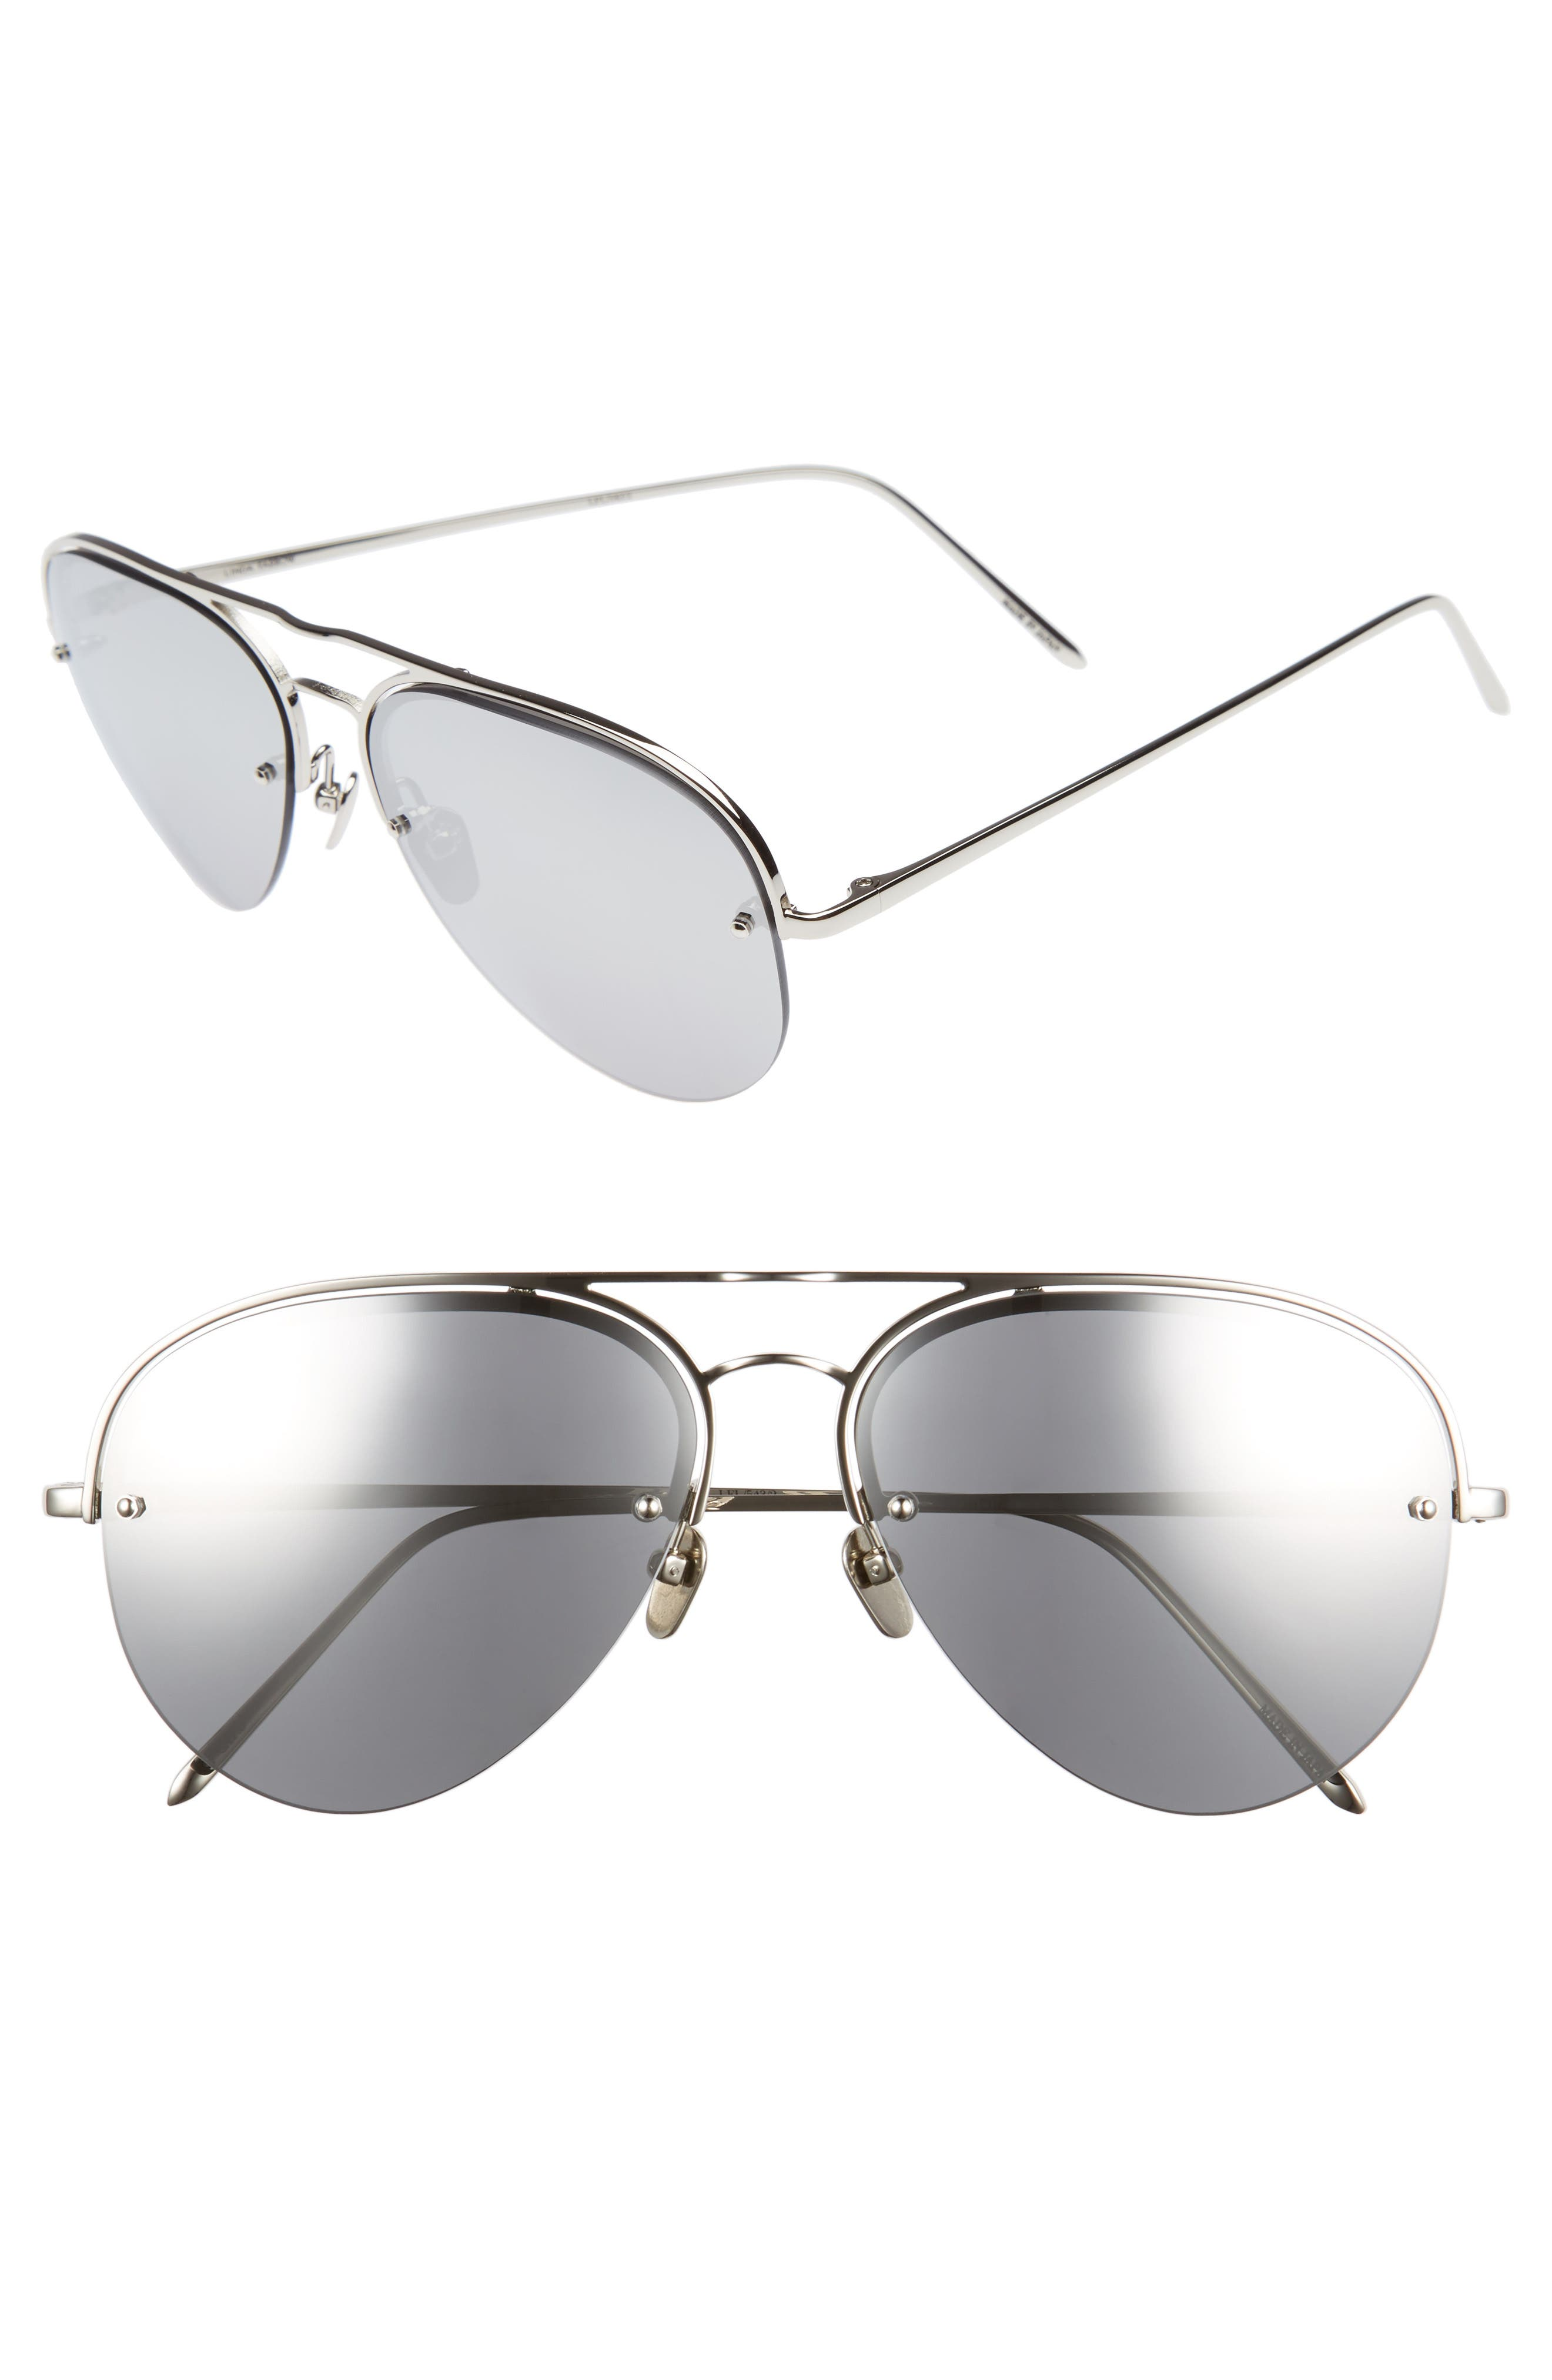 60mm Mirrored 18 Karat Gold Aviator Sunglasses,                         Main,                         color, White Gold/ Platinum